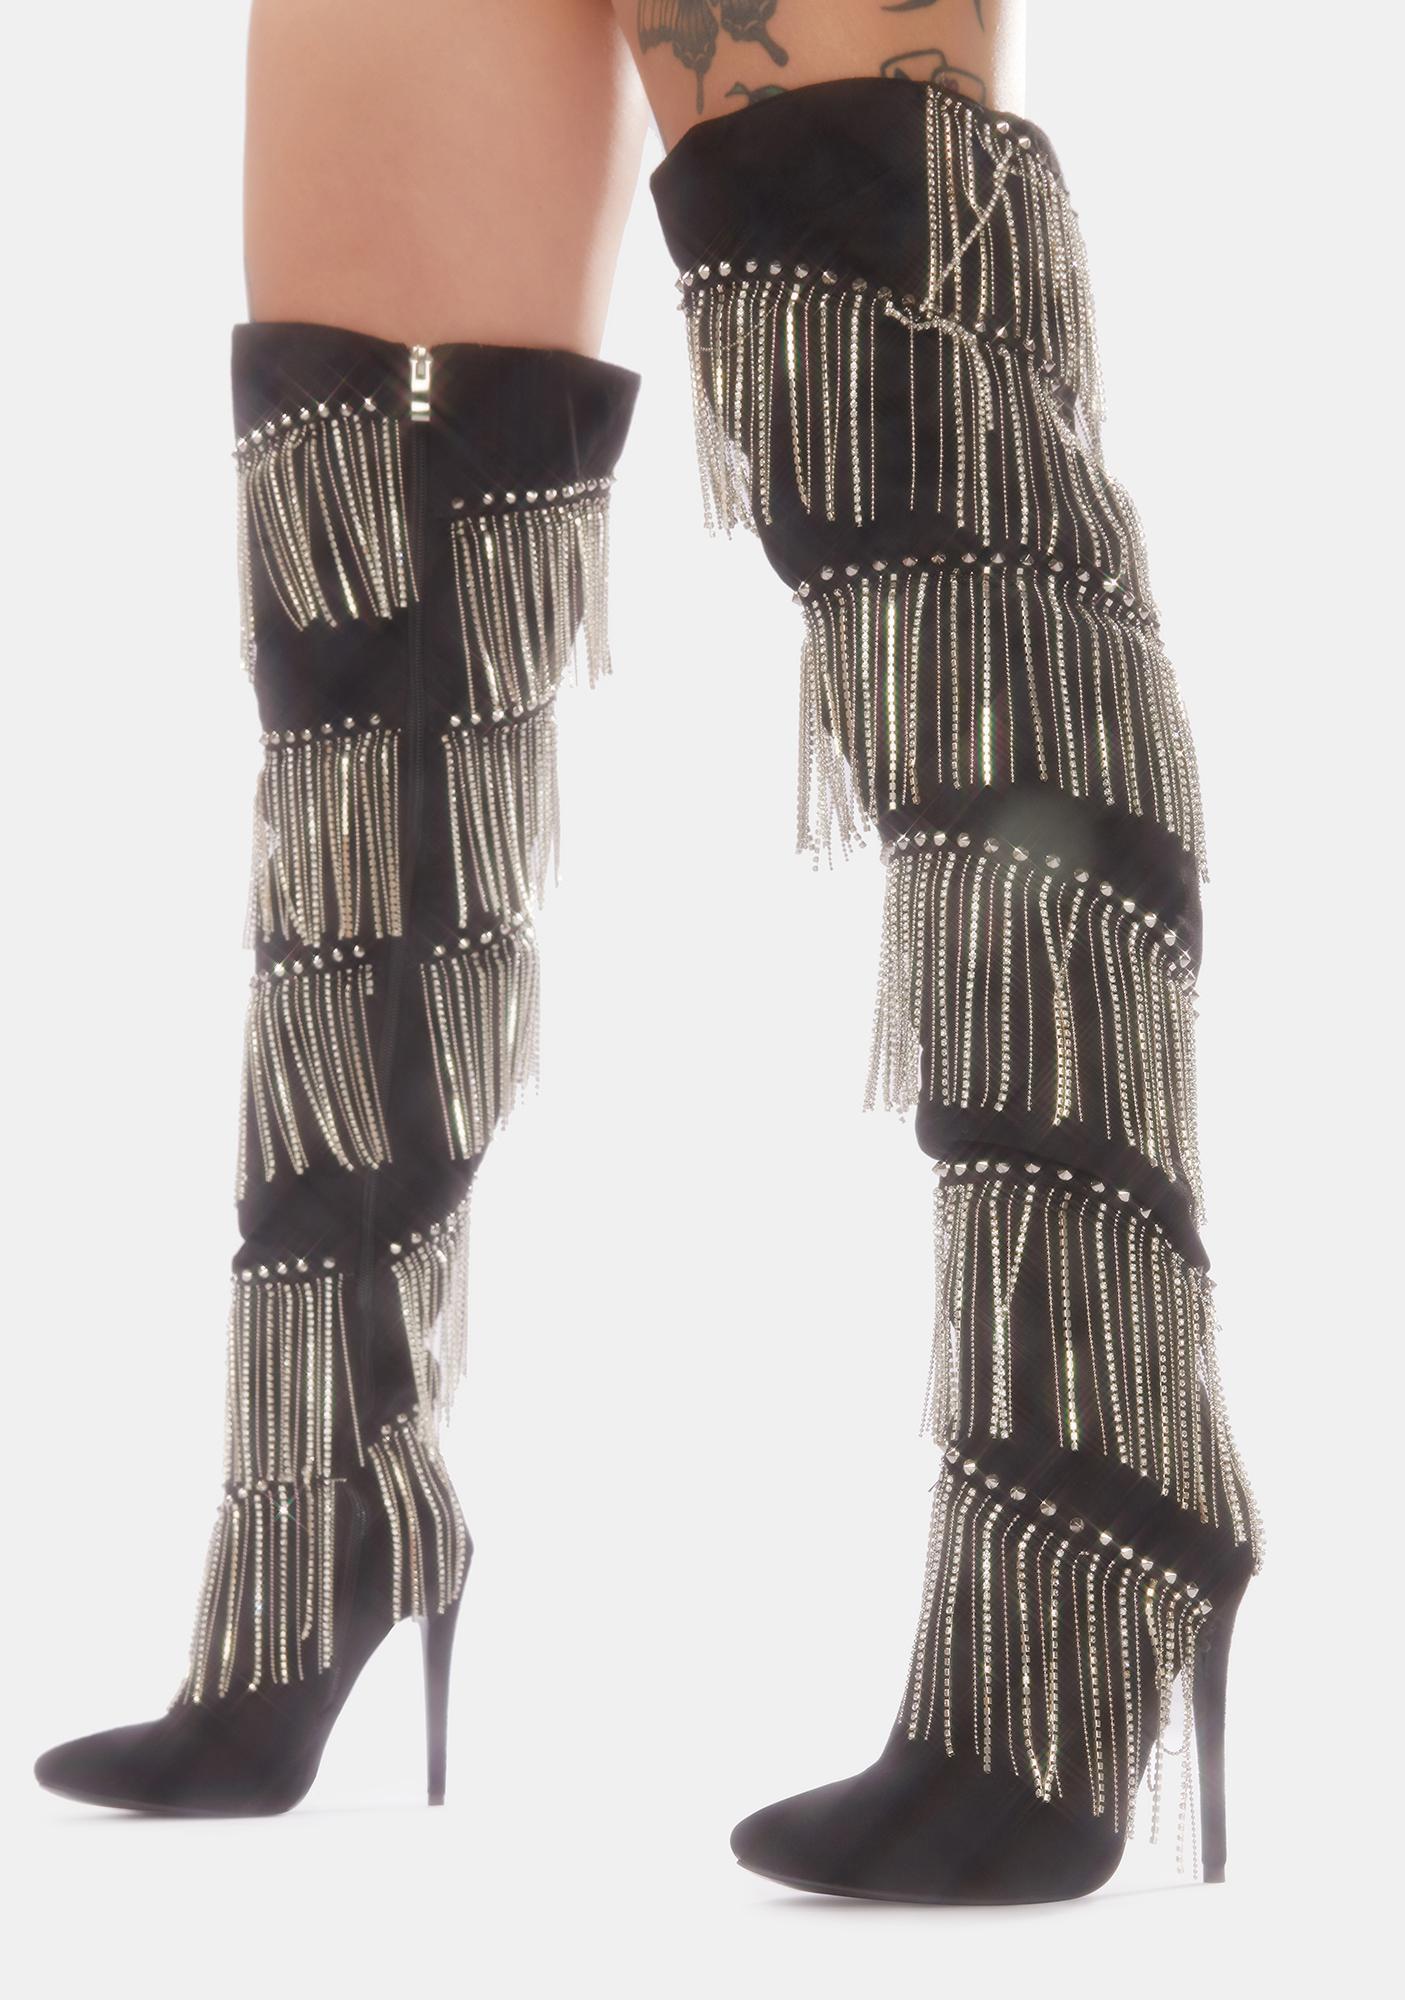 re Worth Stiletto Boots